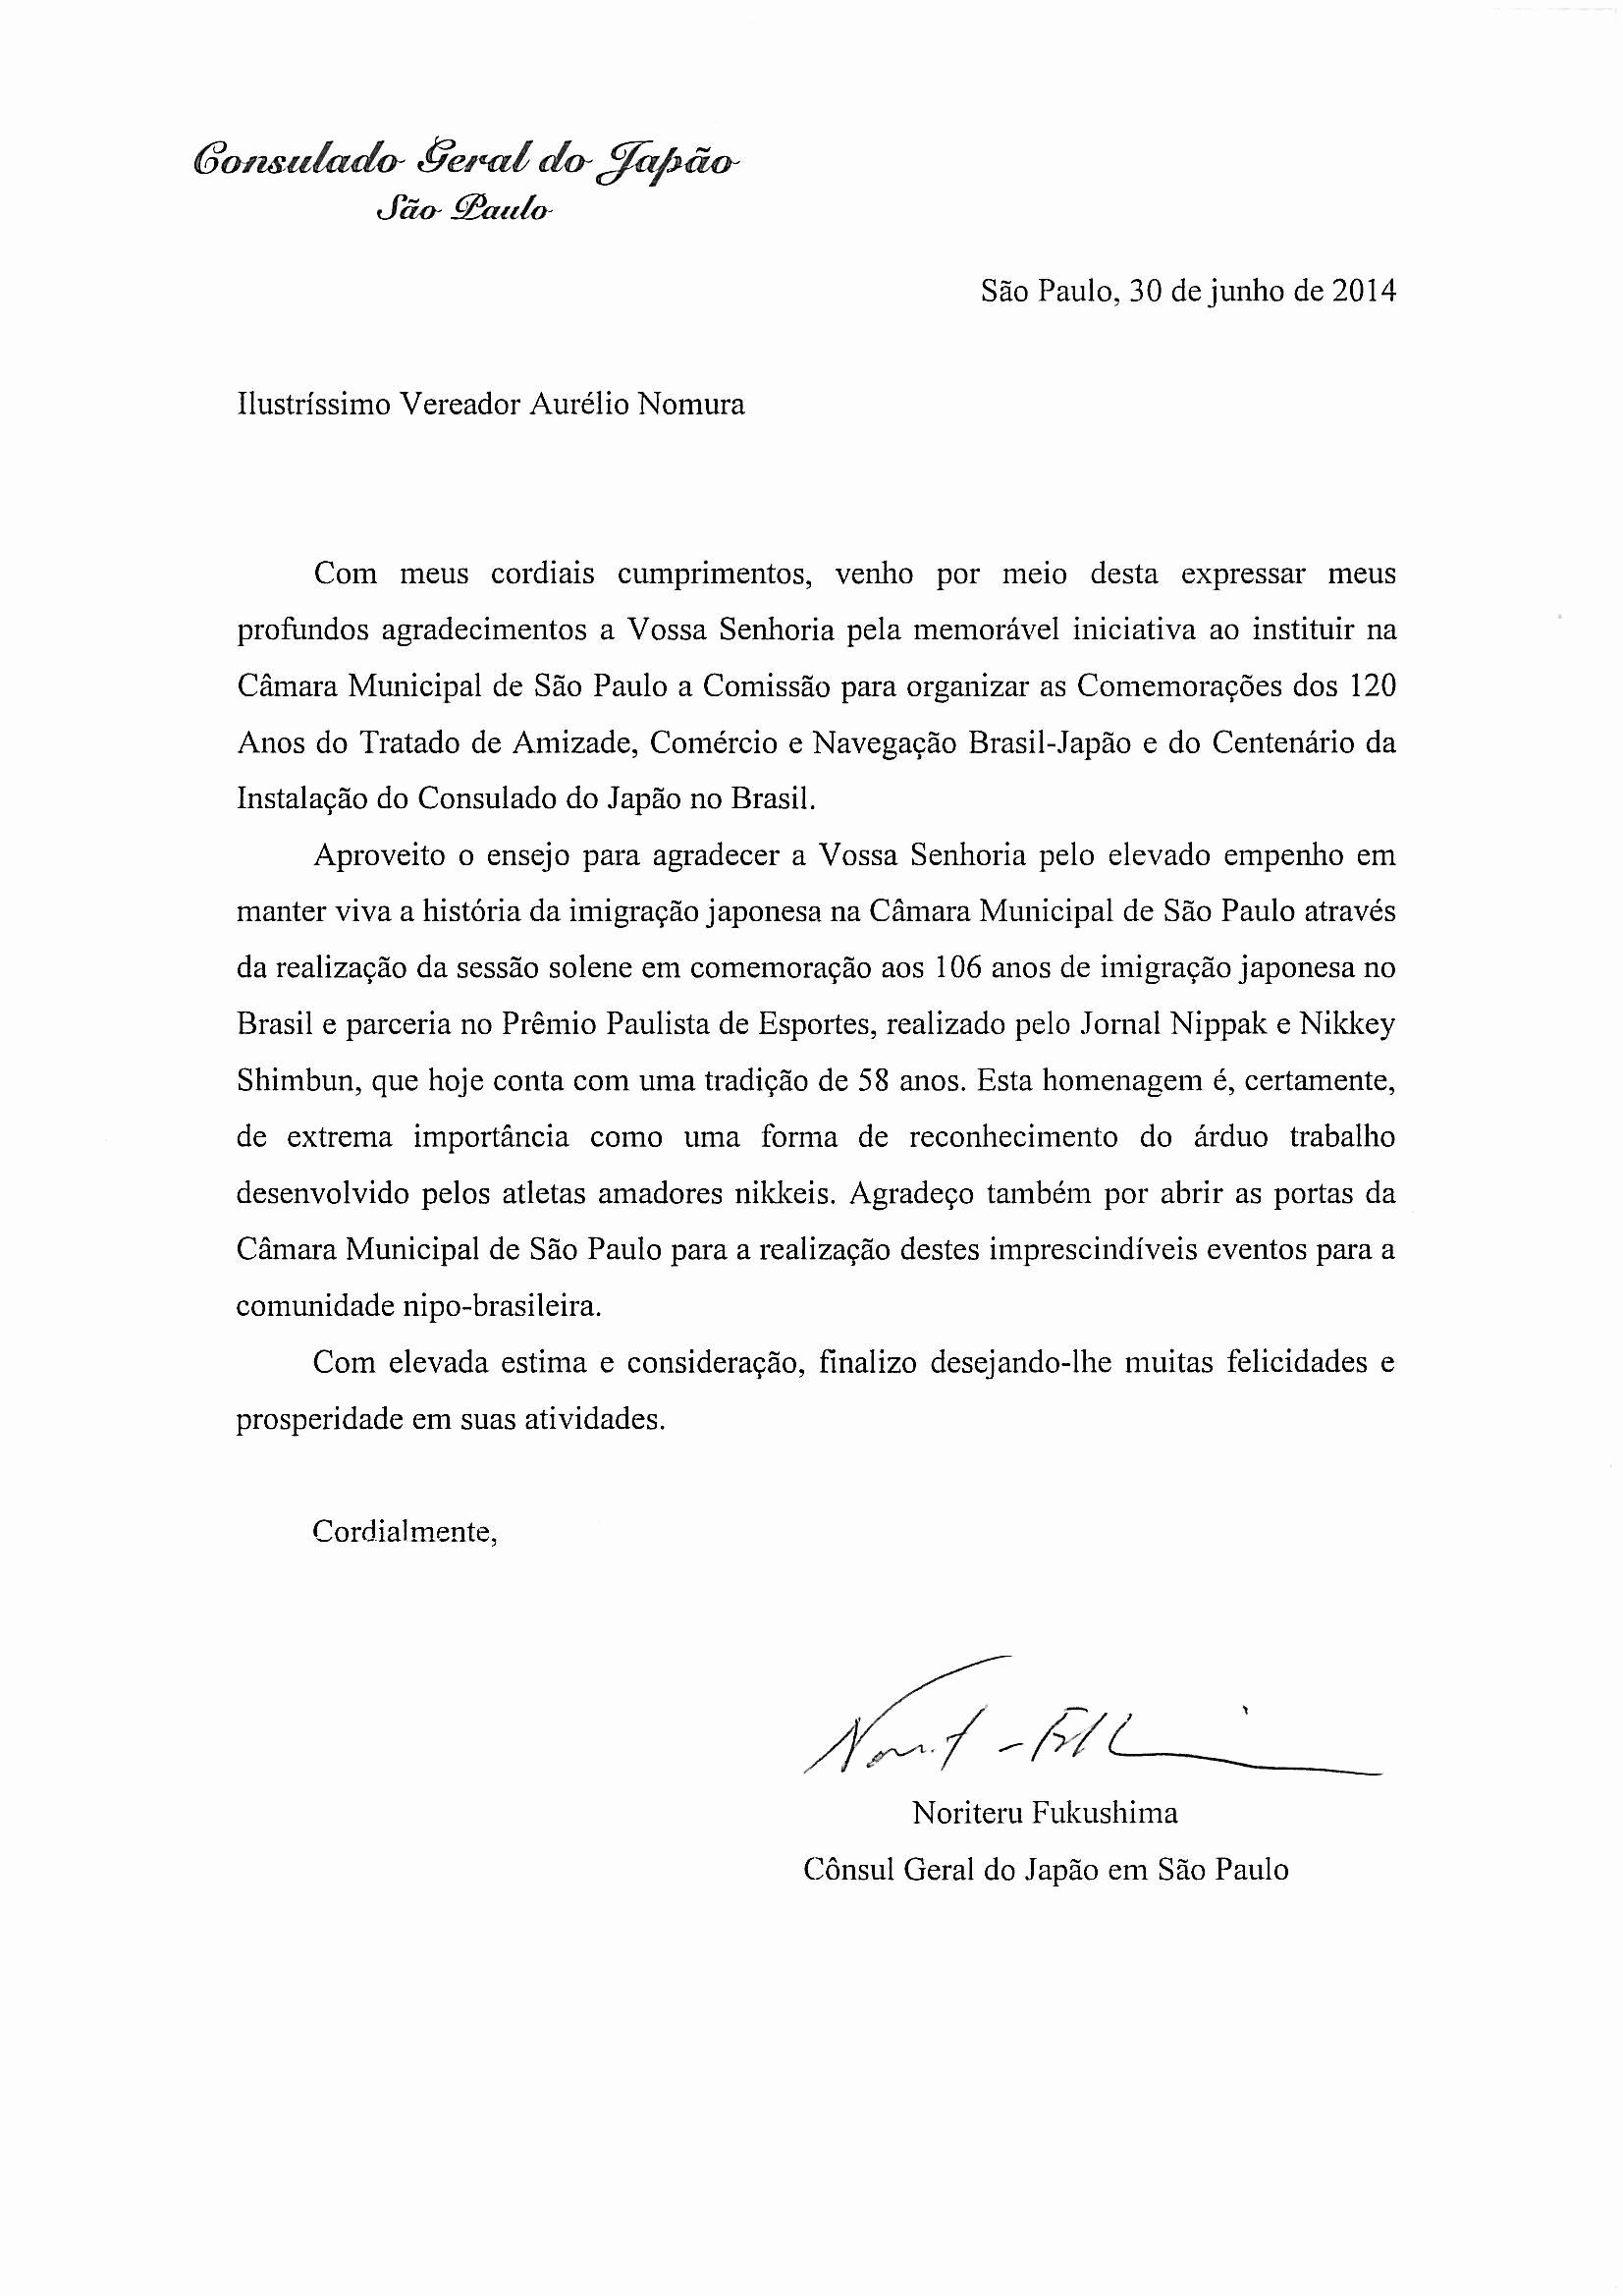 Modelo De Carta De Agradecimento Best Of Vereador Aurélio Nomura